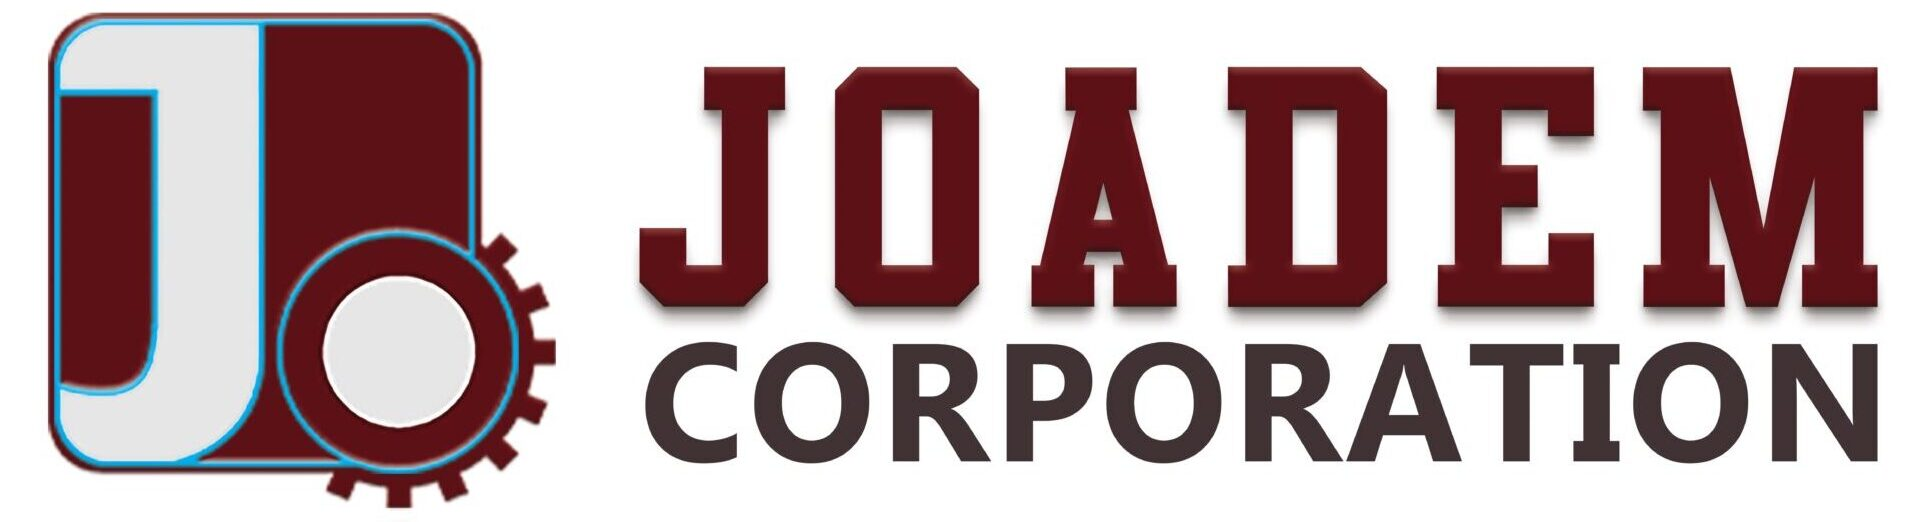 JOADEM Corporation